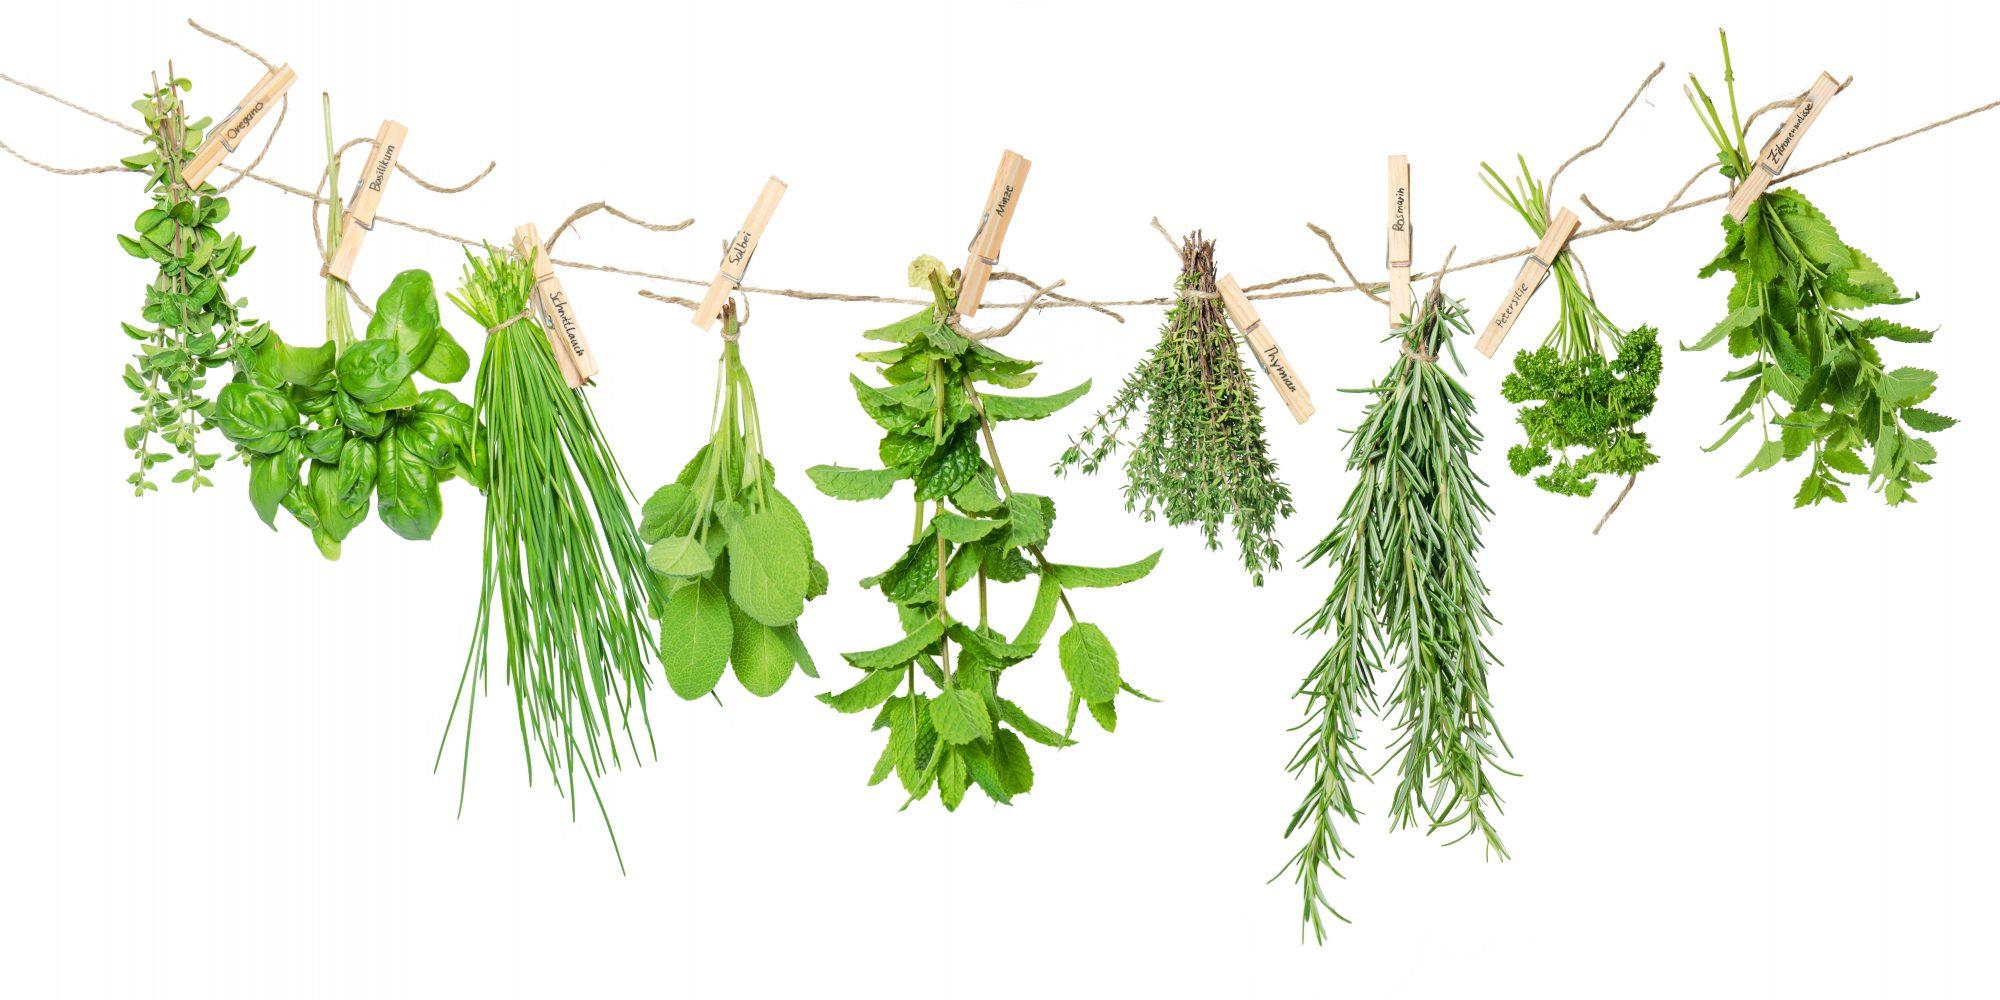 Herbs drying Getty 5/26/20